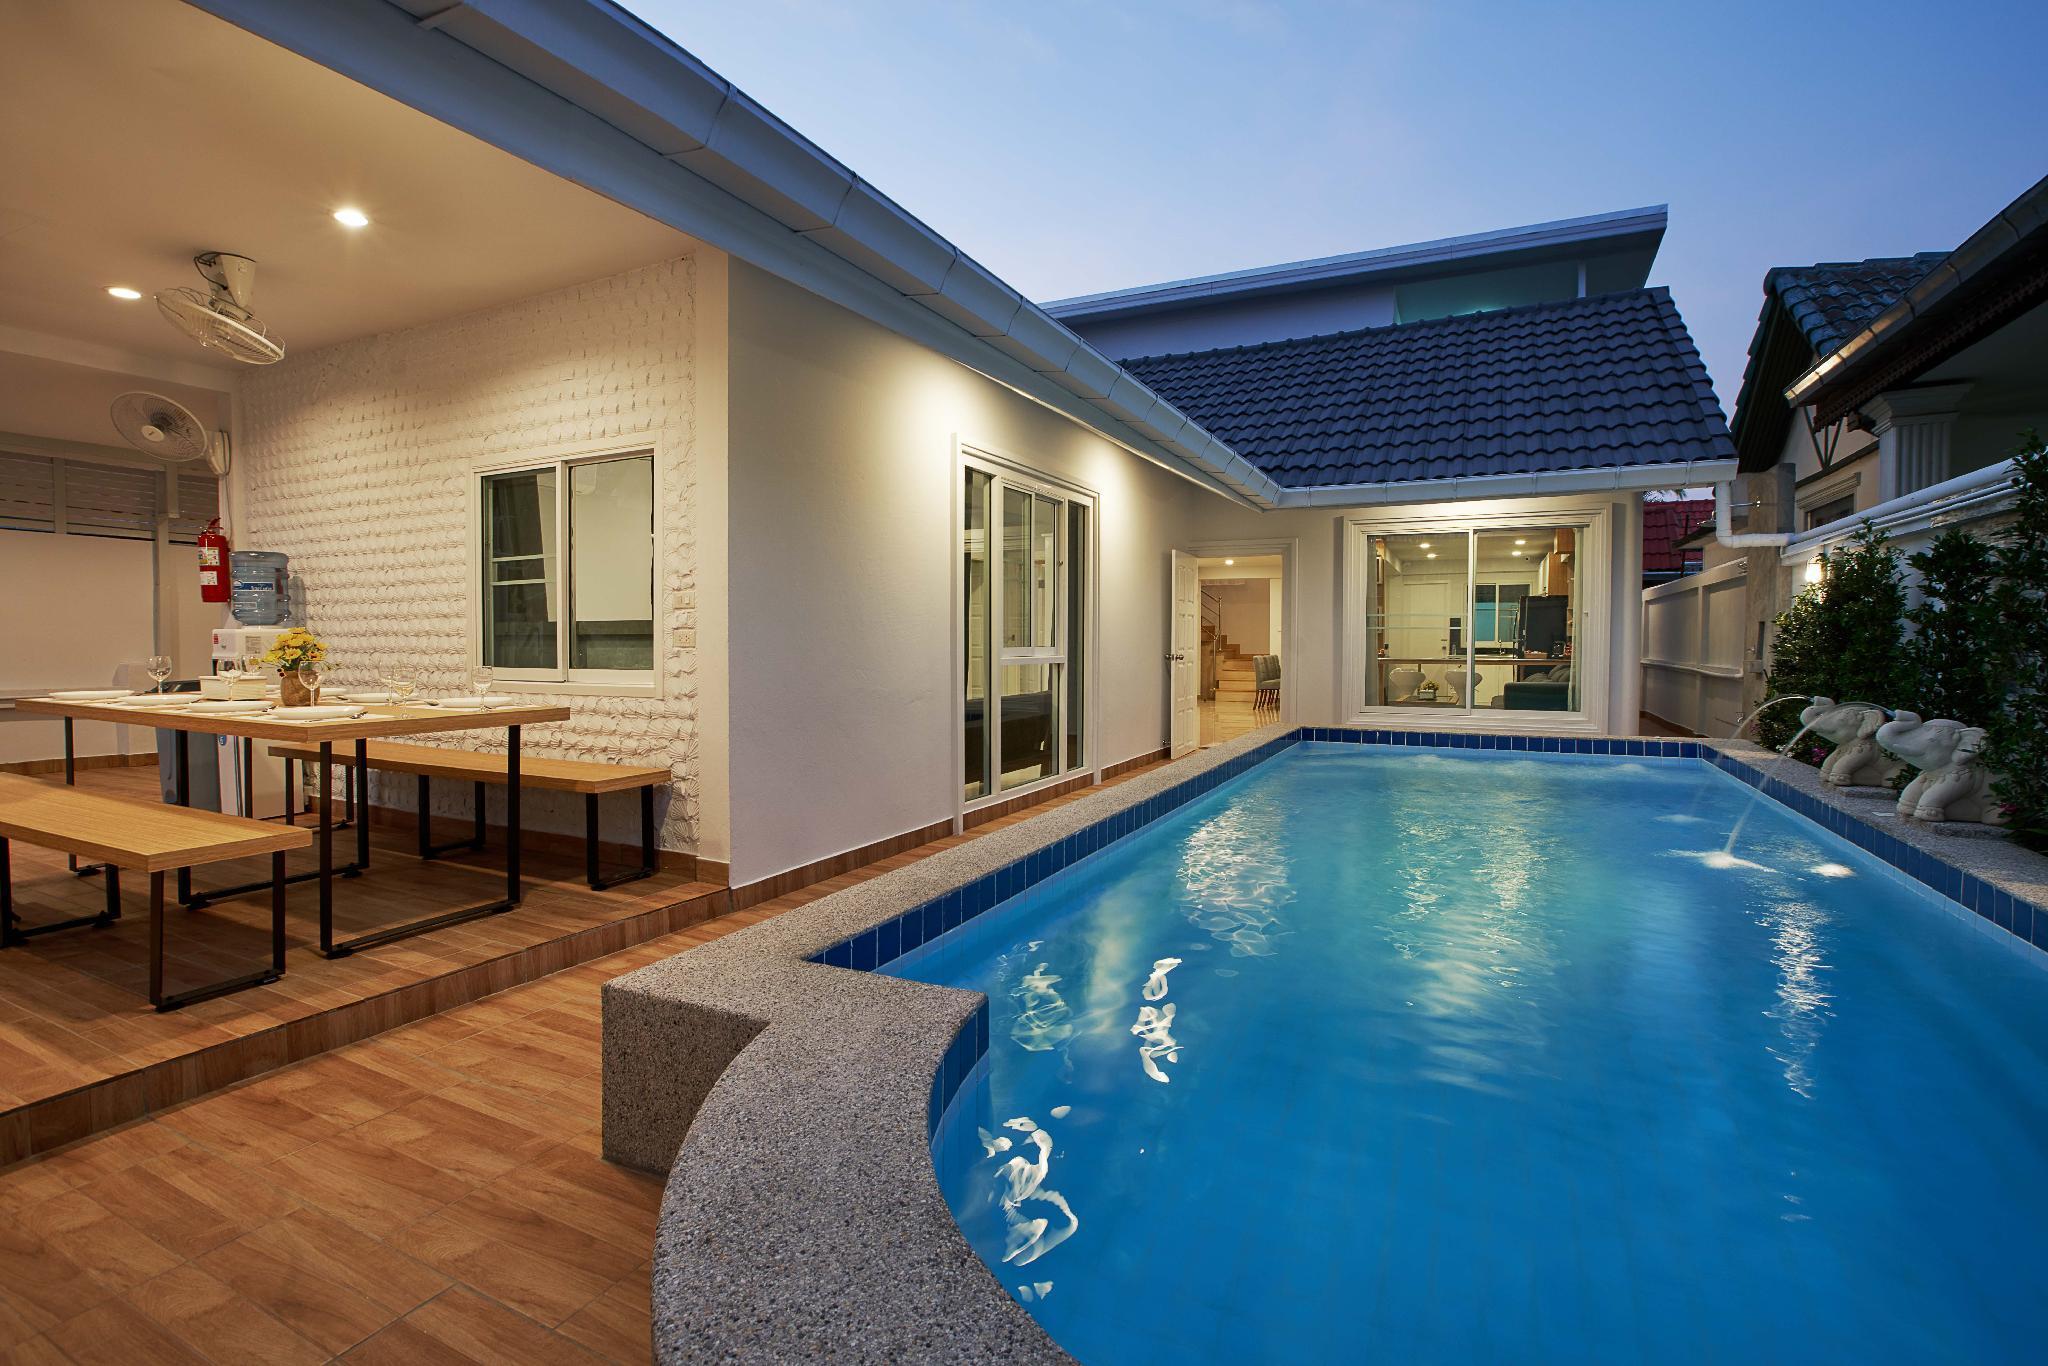 Gala Express New Private 4 BR Pool Villa